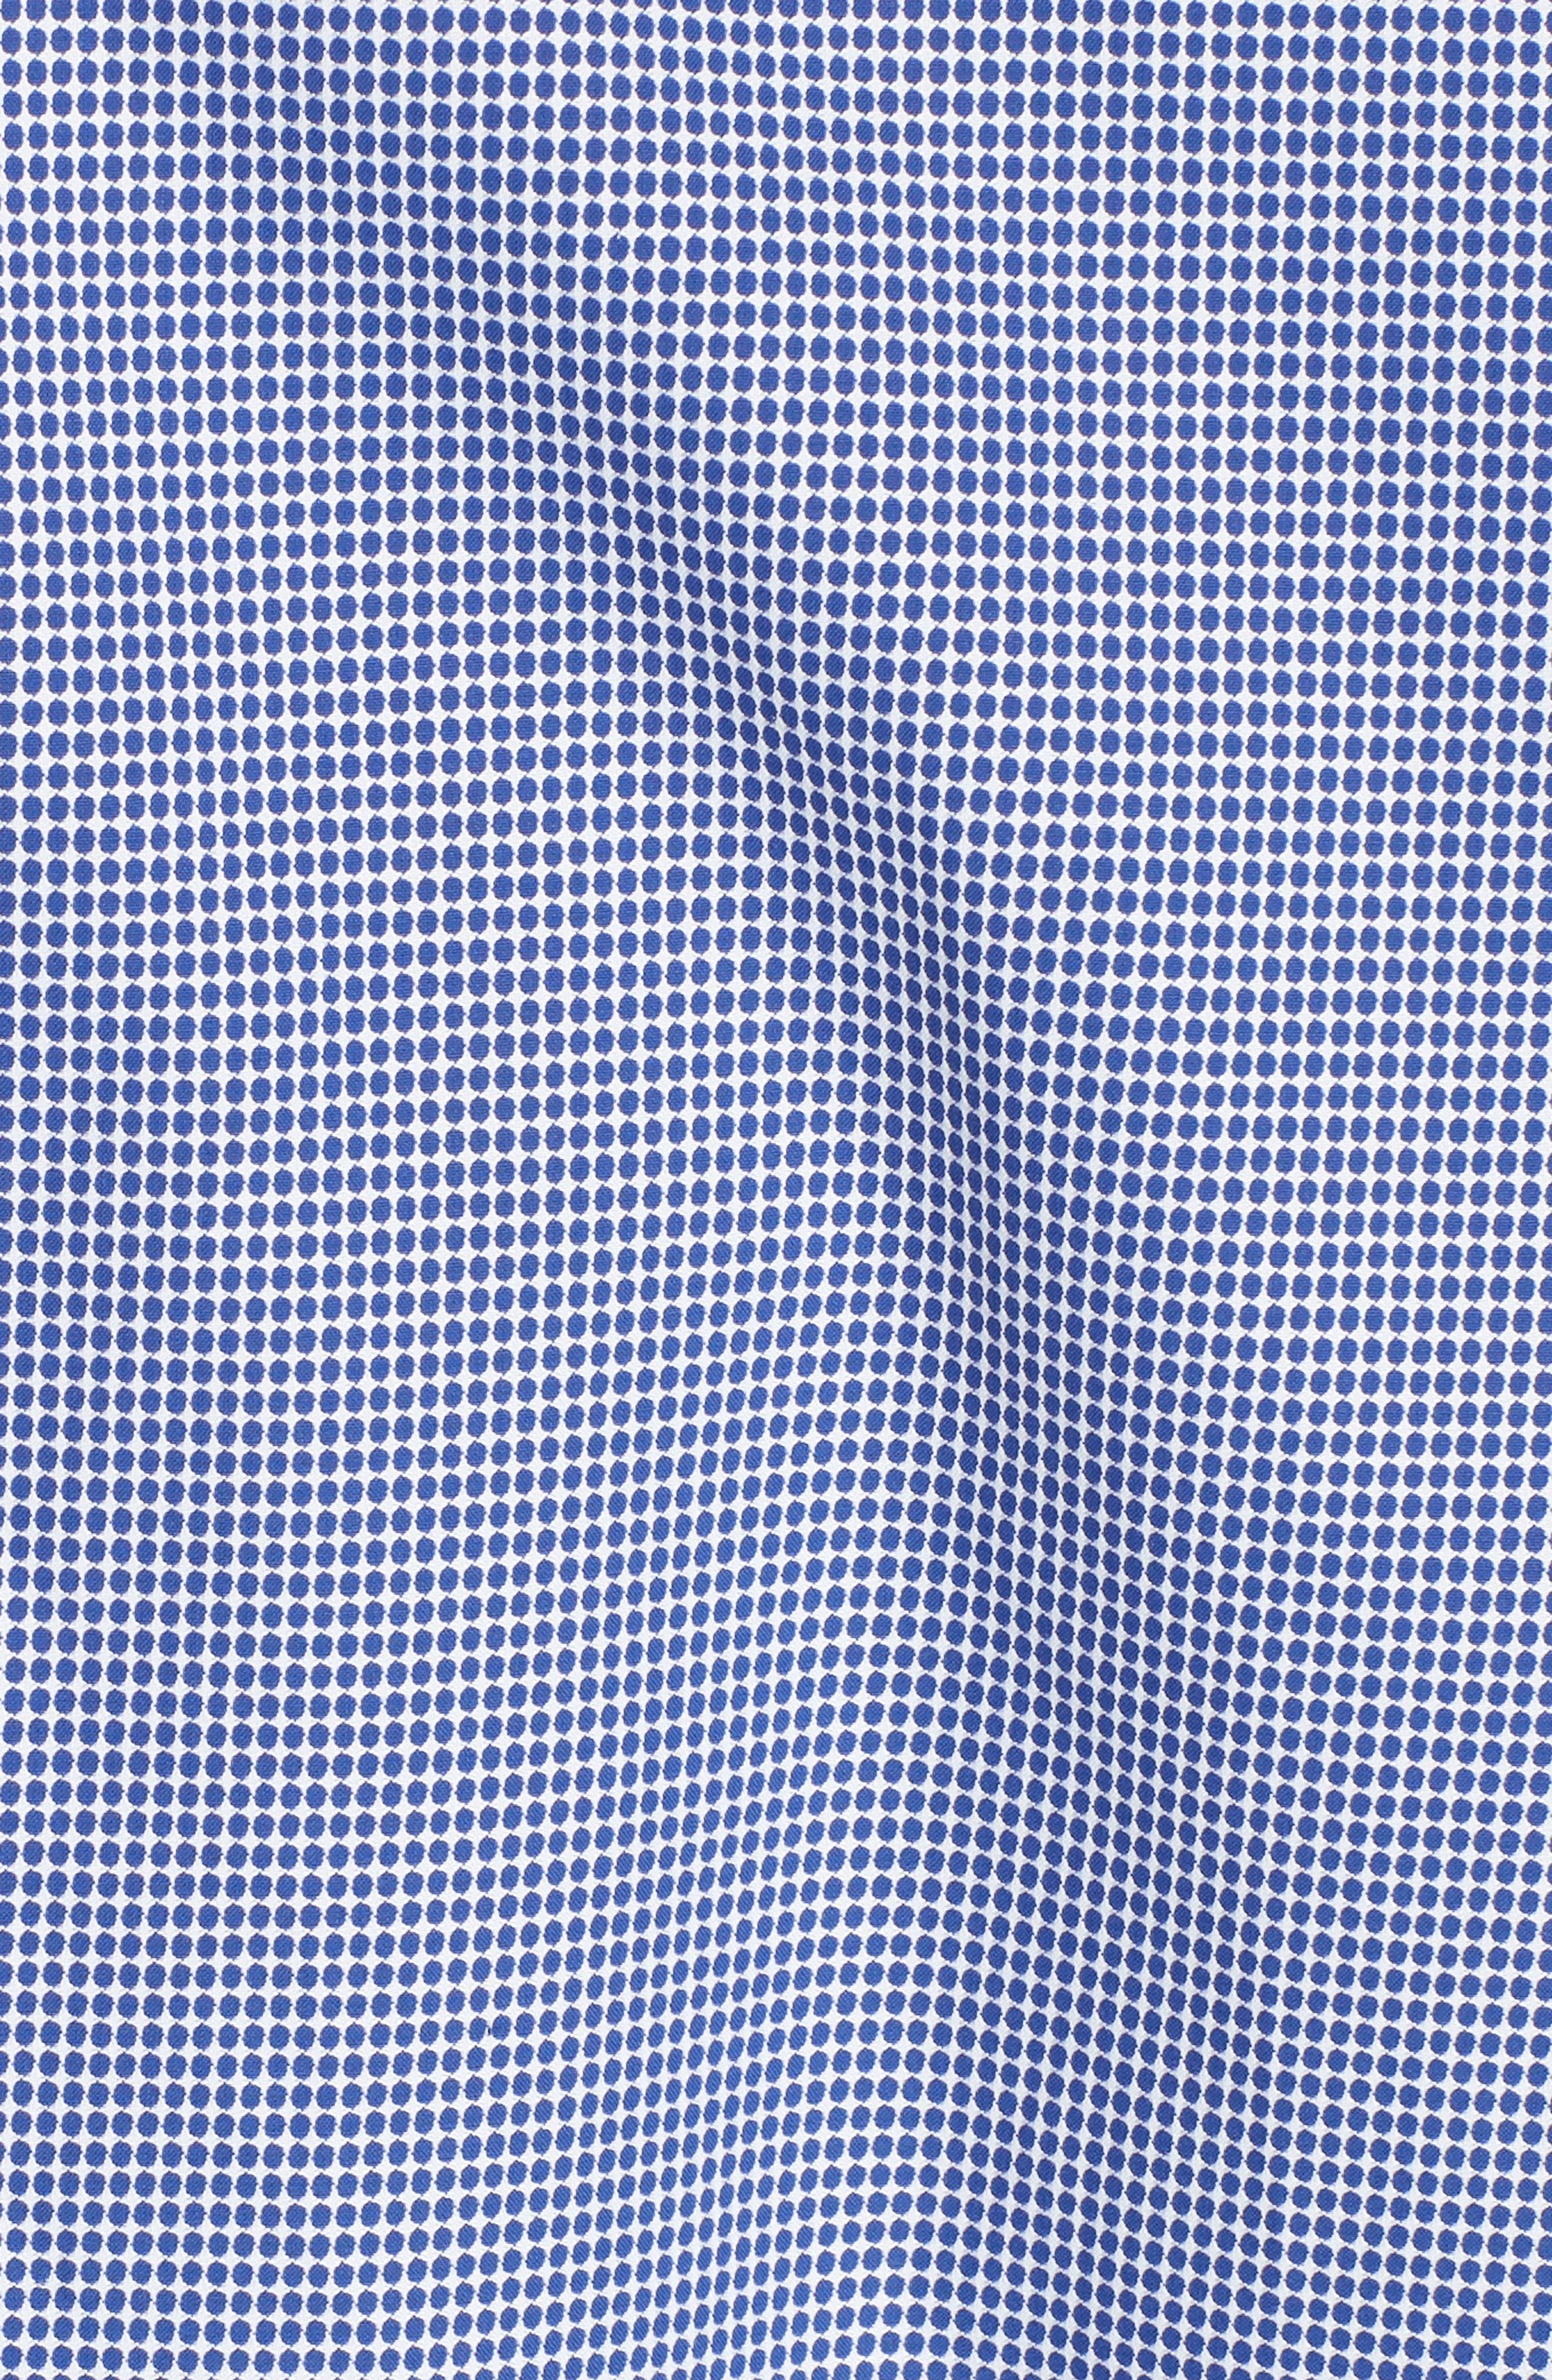 Slim Fit Dot Dress Shirt,                             Alternate thumbnail 5, color,                             NAVY